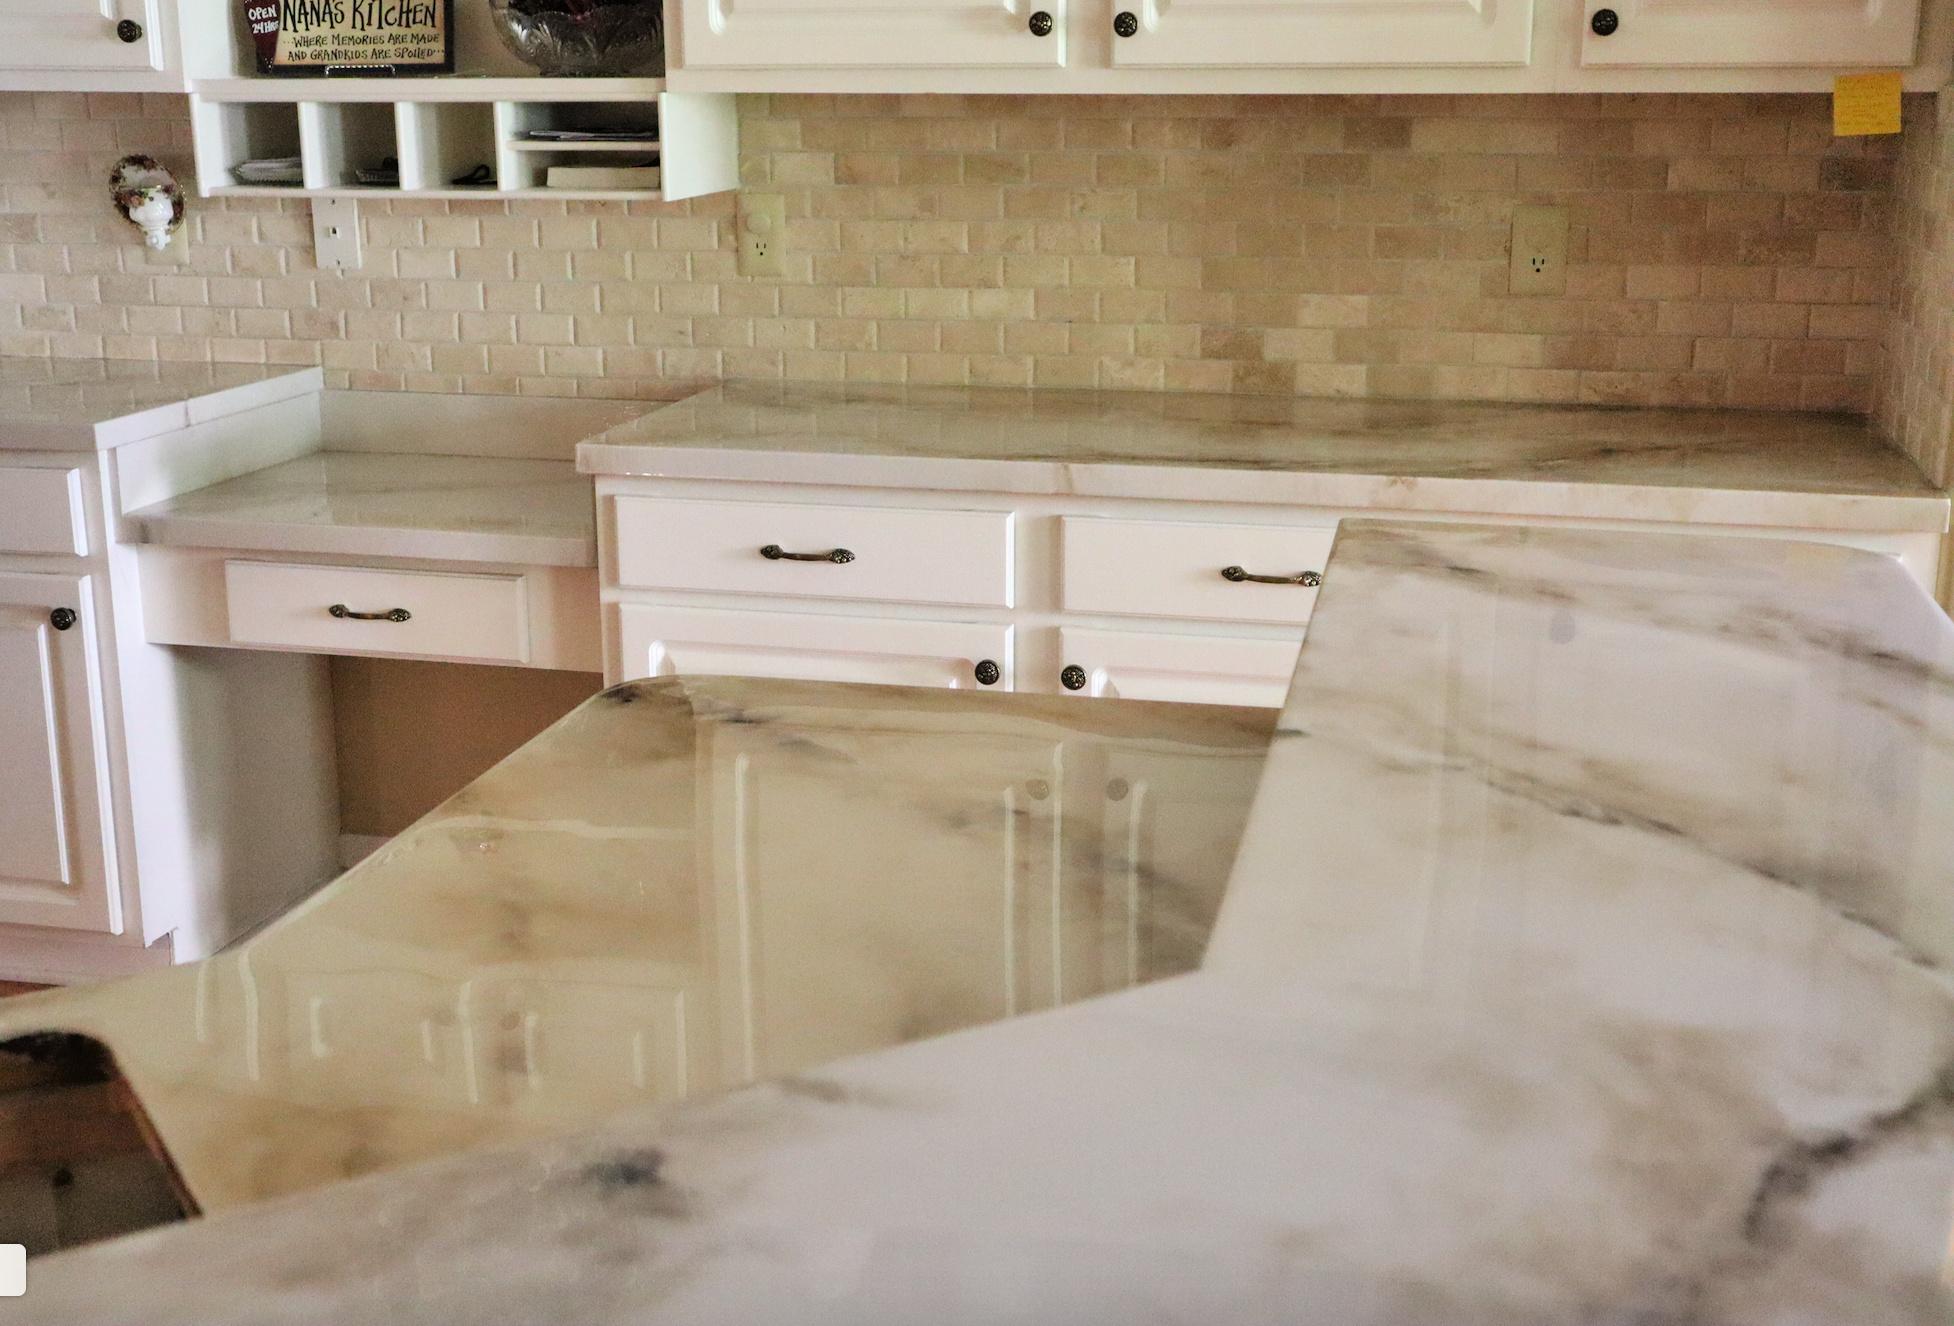 epoxy over laminate counters aka